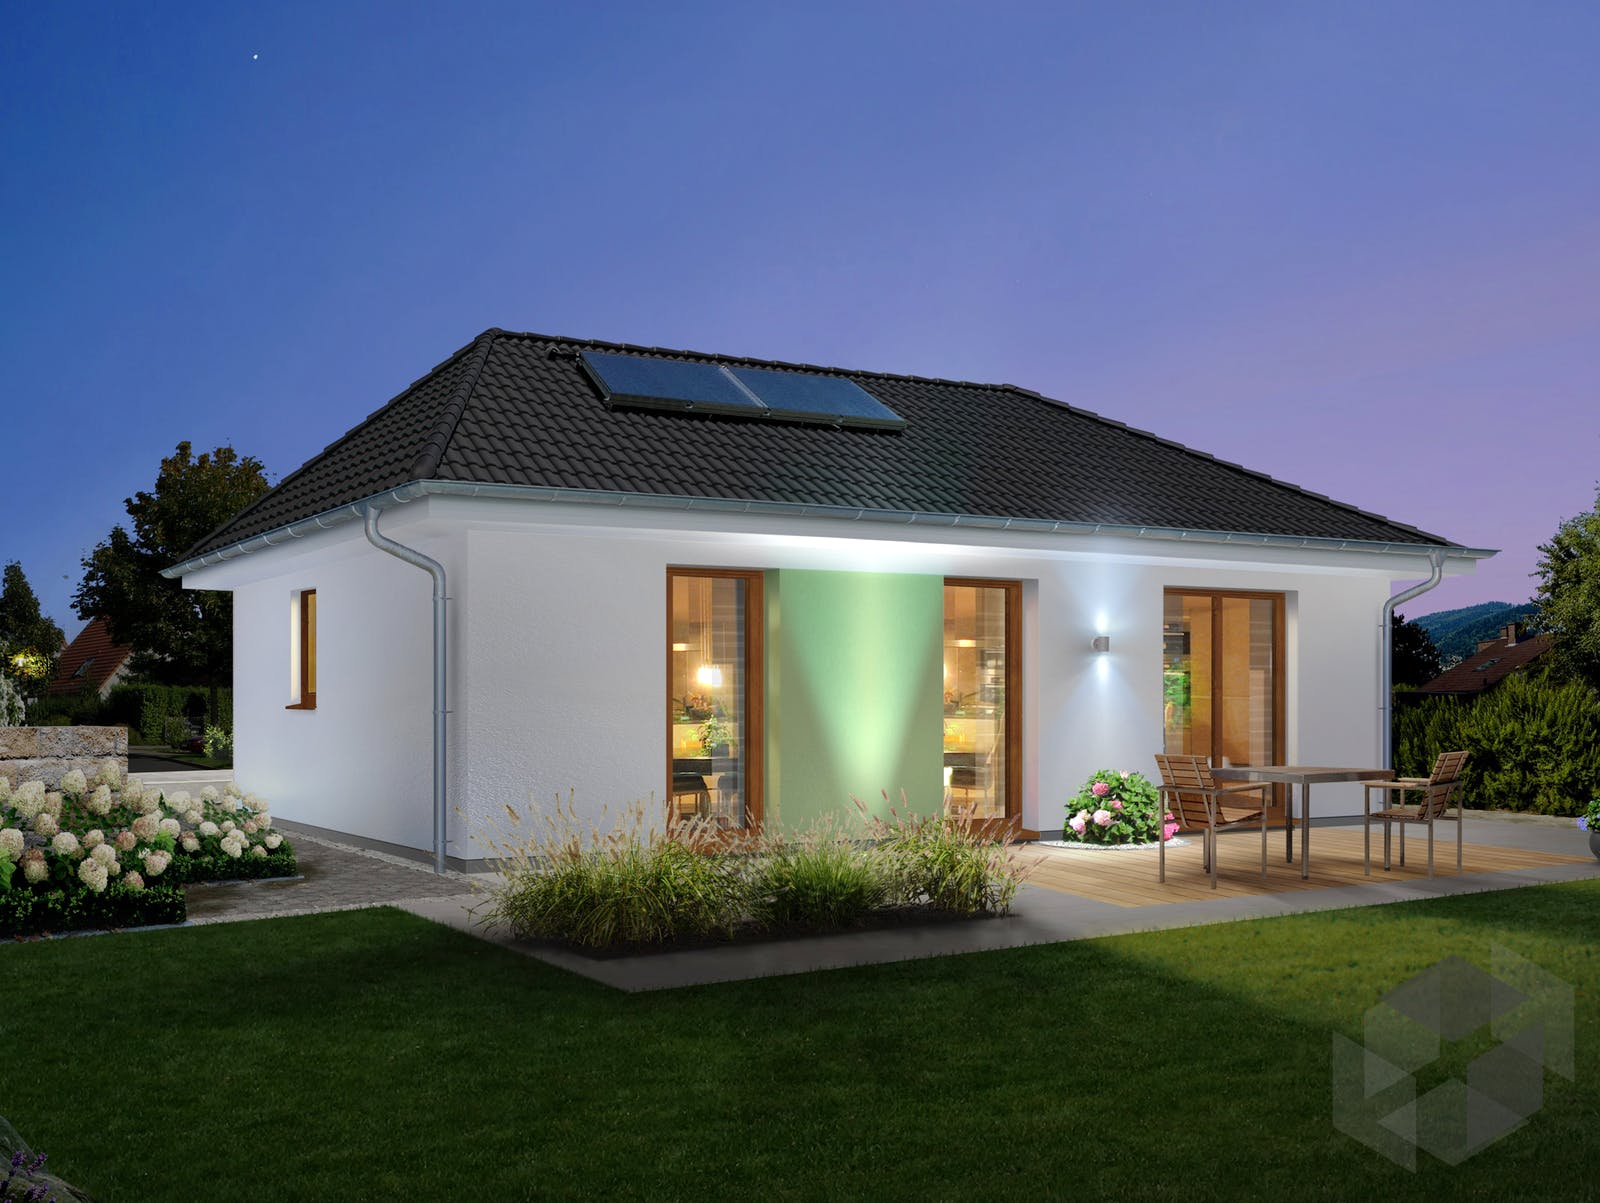 massivhaus bungalow 78 von town country haus. Black Bedroom Furniture Sets. Home Design Ideas